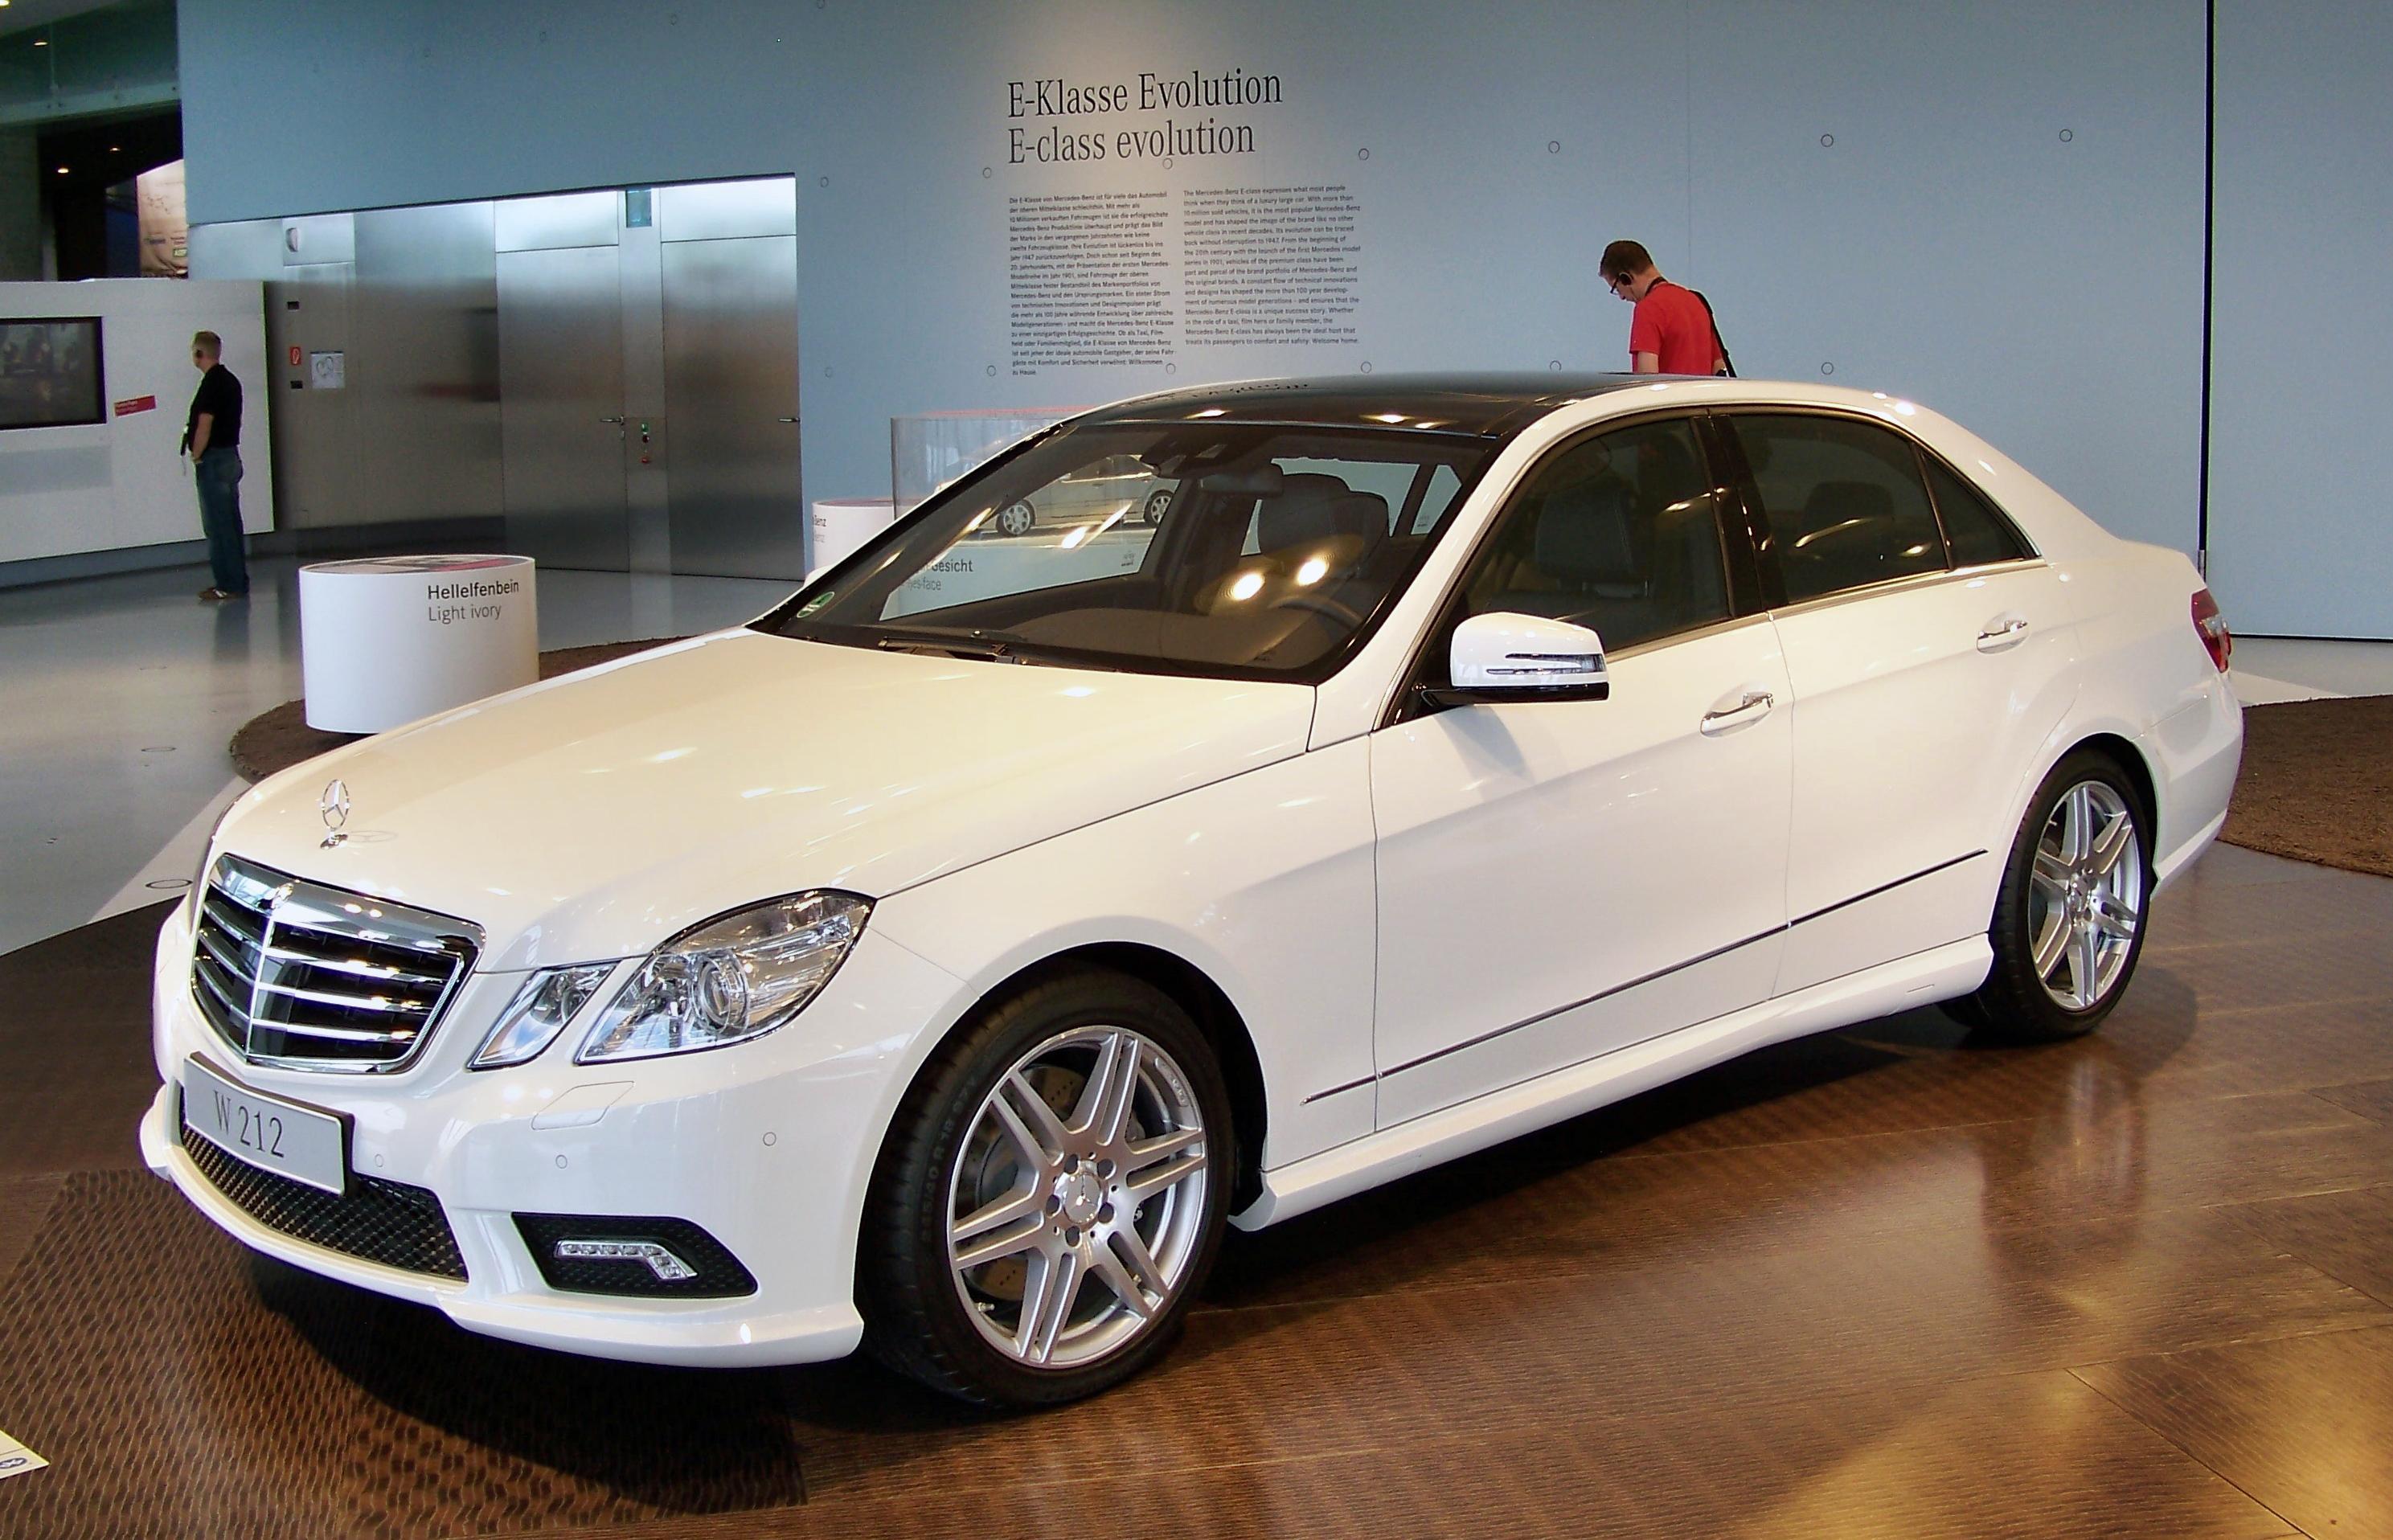 File White W212 E 500 Amg Mercedes Museum Jpg Wikimedia